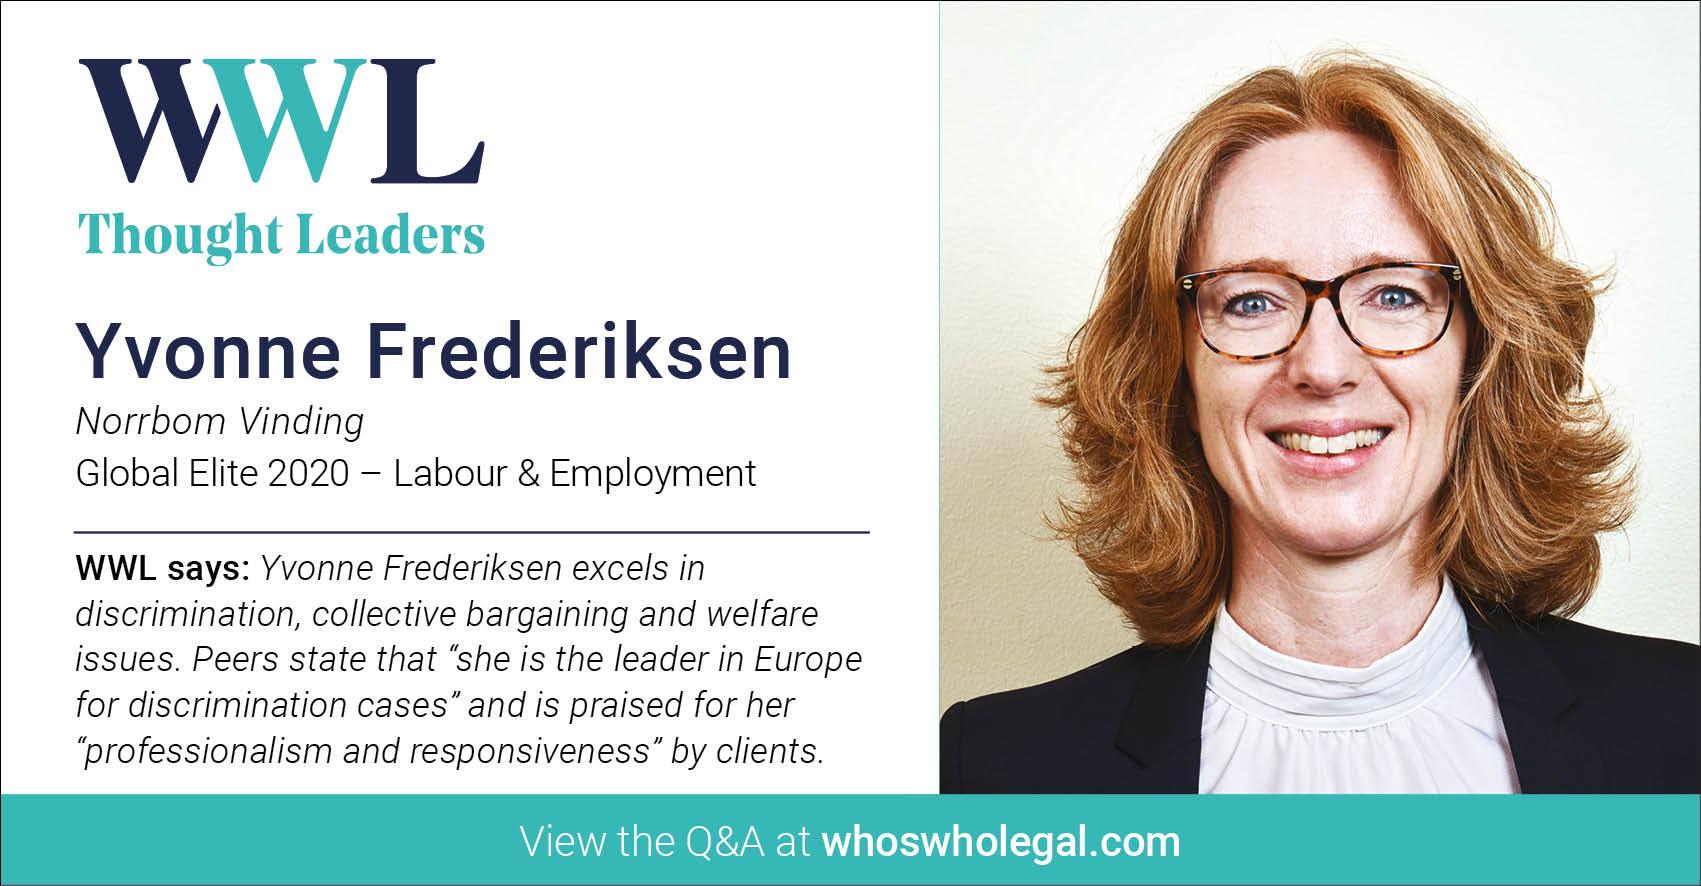 Thought Leaders Global Elite 2020: Yvonne Frederiksen - Lexology